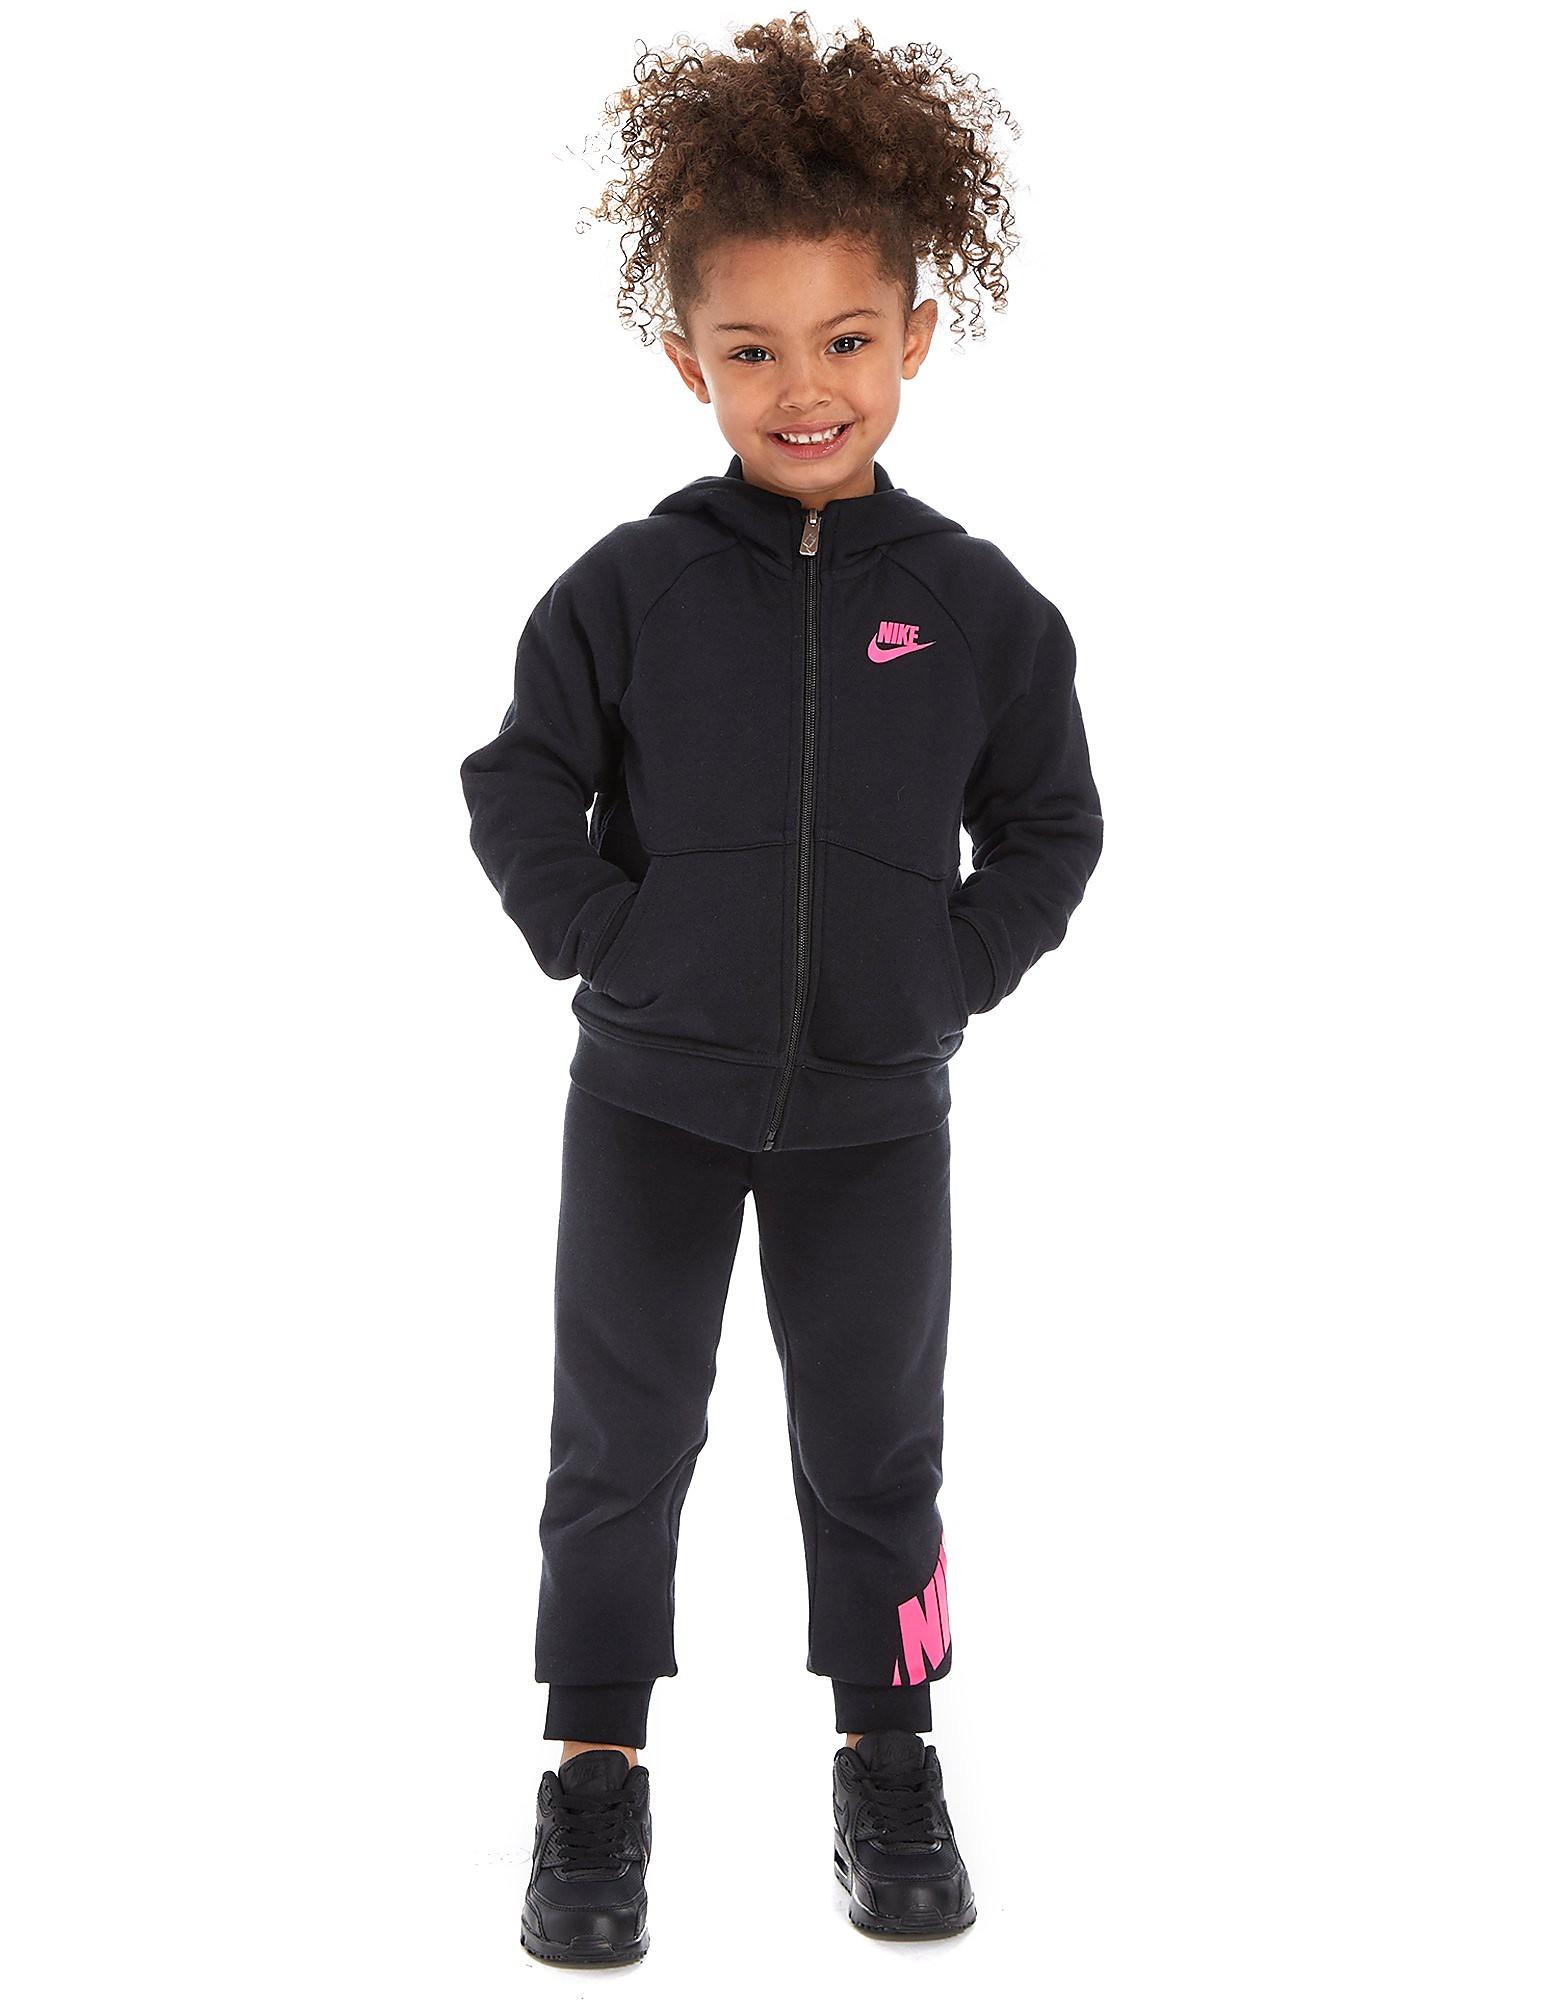 Nike Girls' Futura Fleece Suit Children